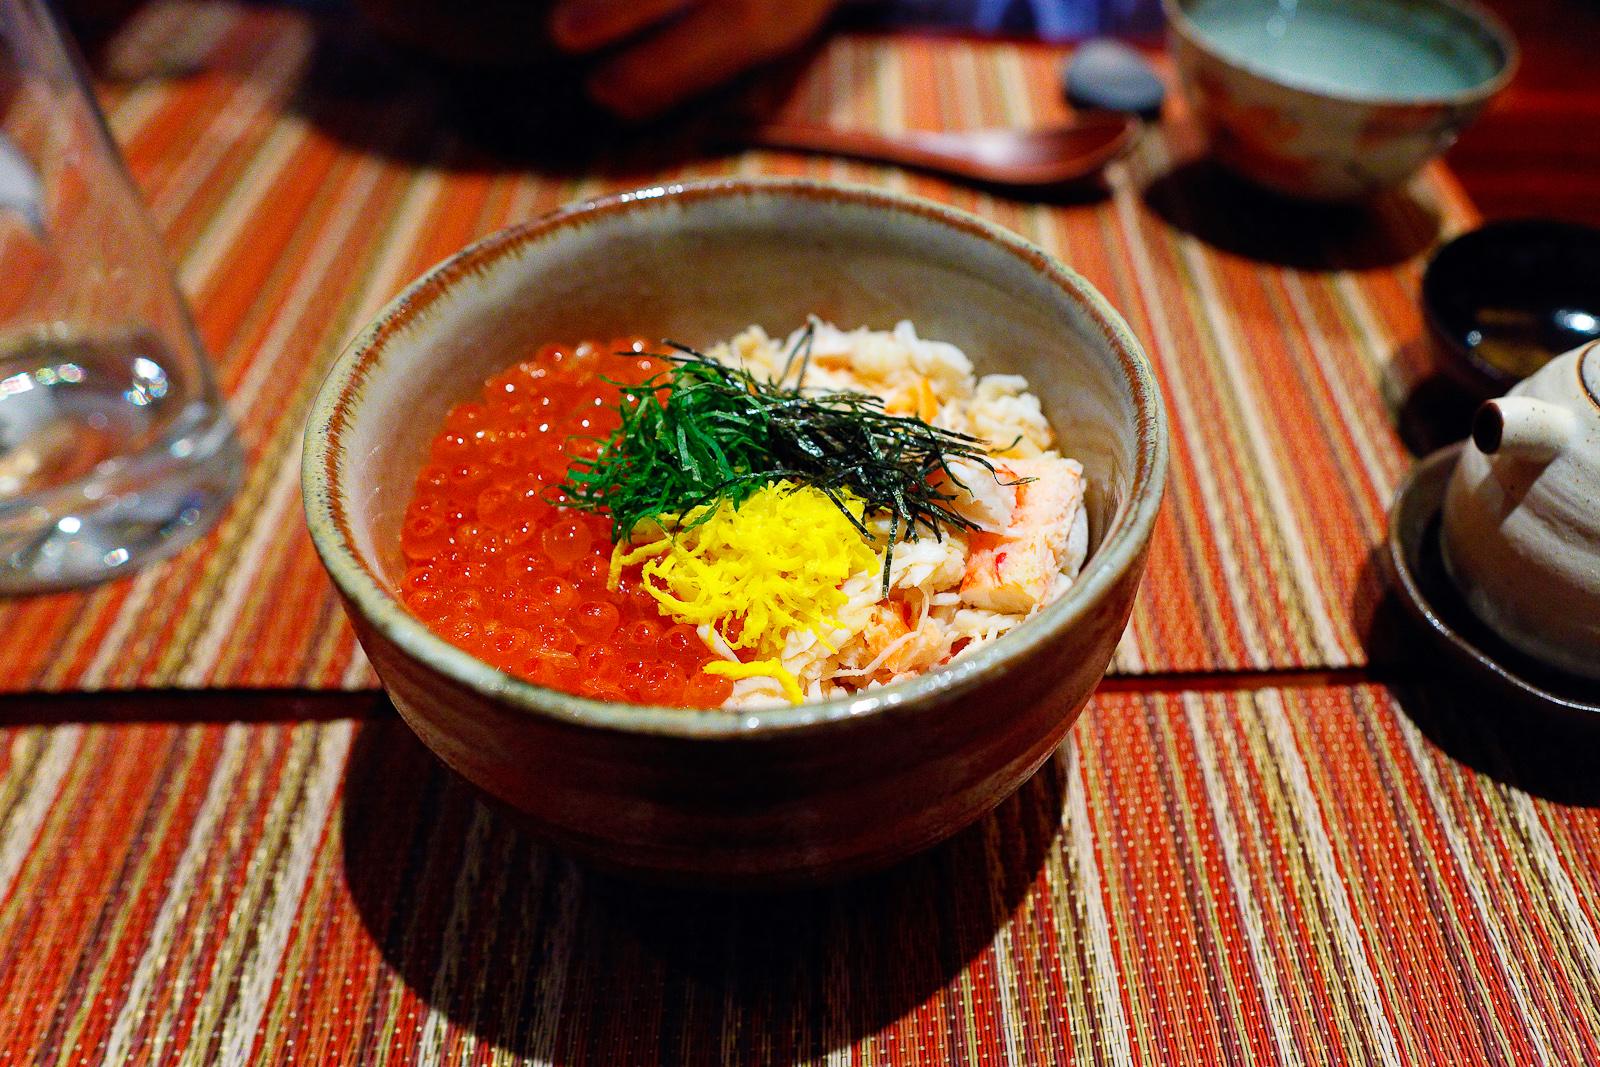 Kani ikura don, Alaskan king crab and dashi-marinated salmon roe over rice ($29)